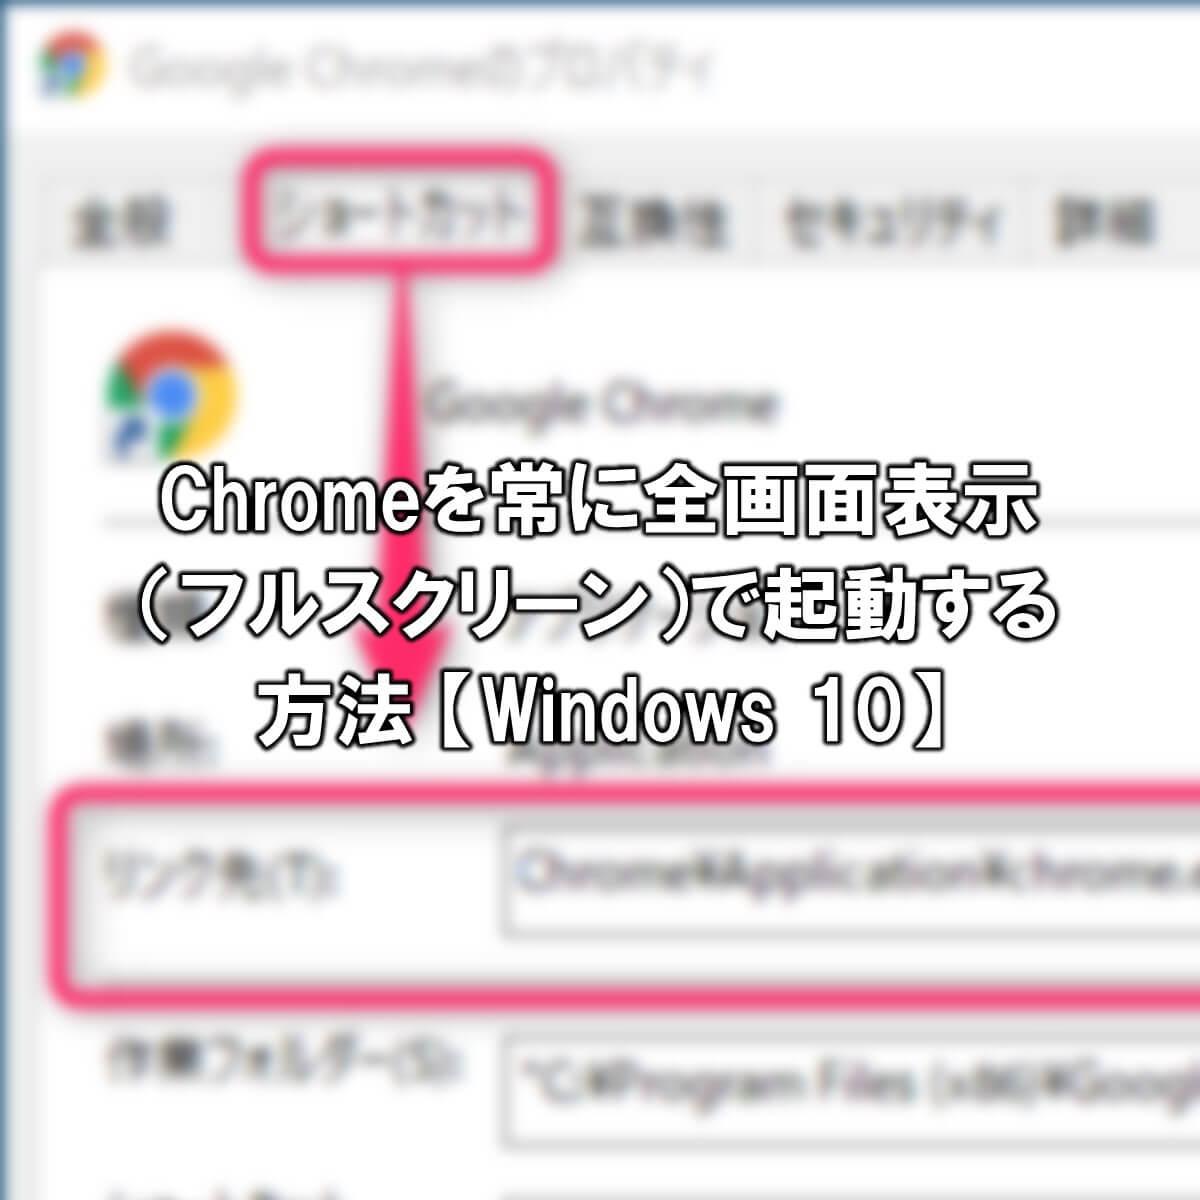 Chromeを常に全画面表示(フルスクリーン)で起動する方法